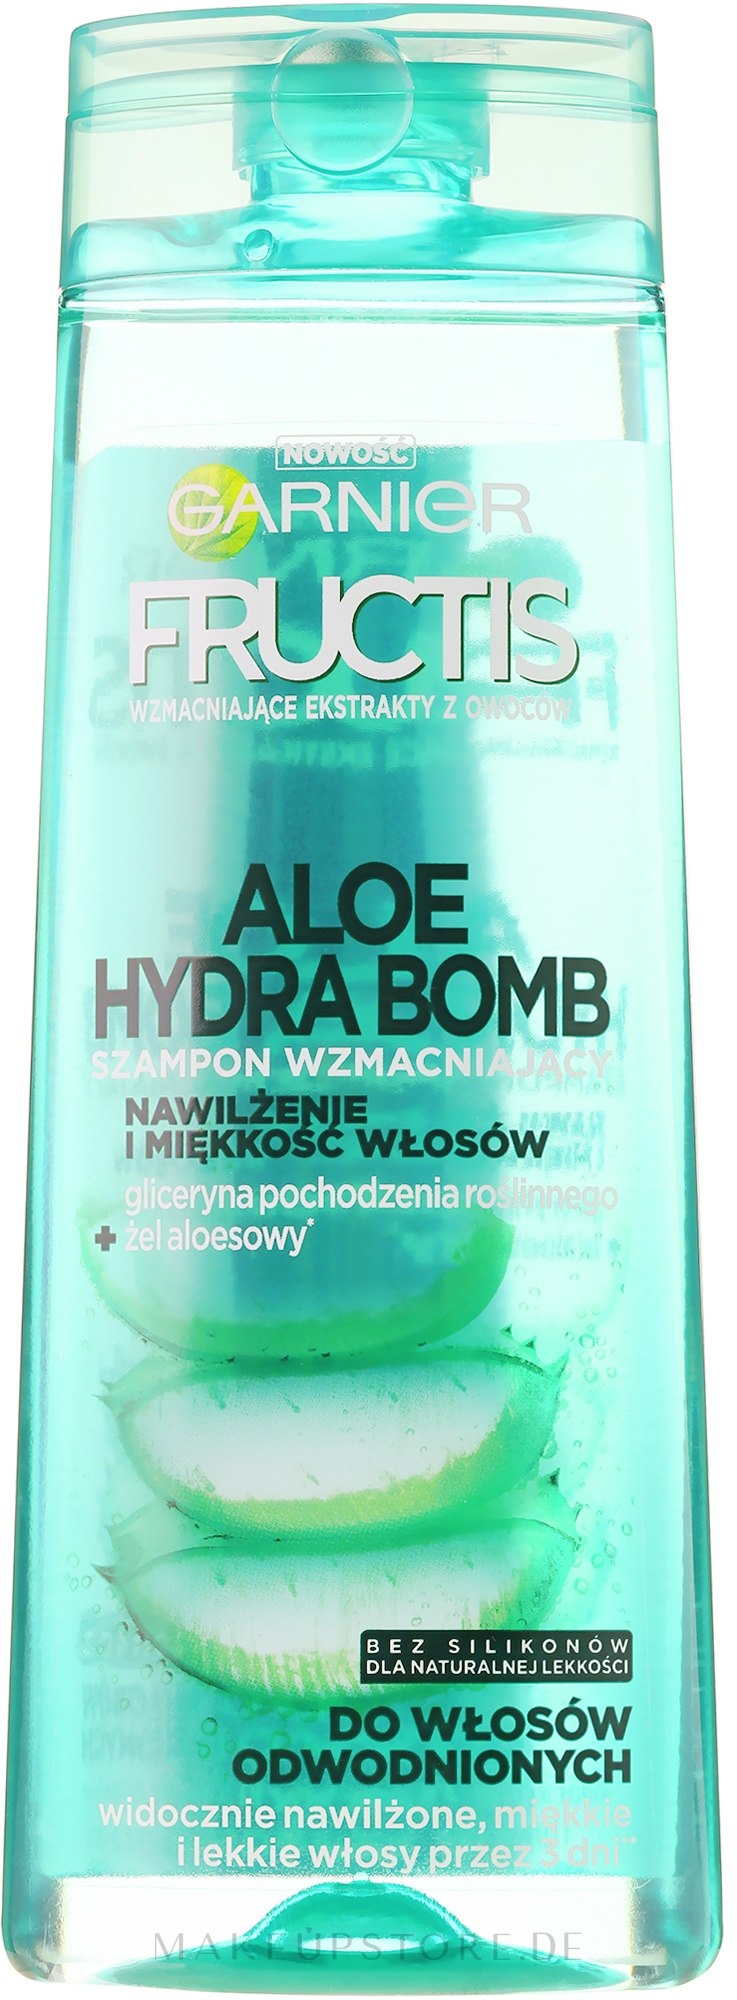 "Kräftigendes Shampoo ""Aloe Hydra Bomb"" - Garnier Fructis Aloe Hydra Bomb Szampon — Bild 400 ml"